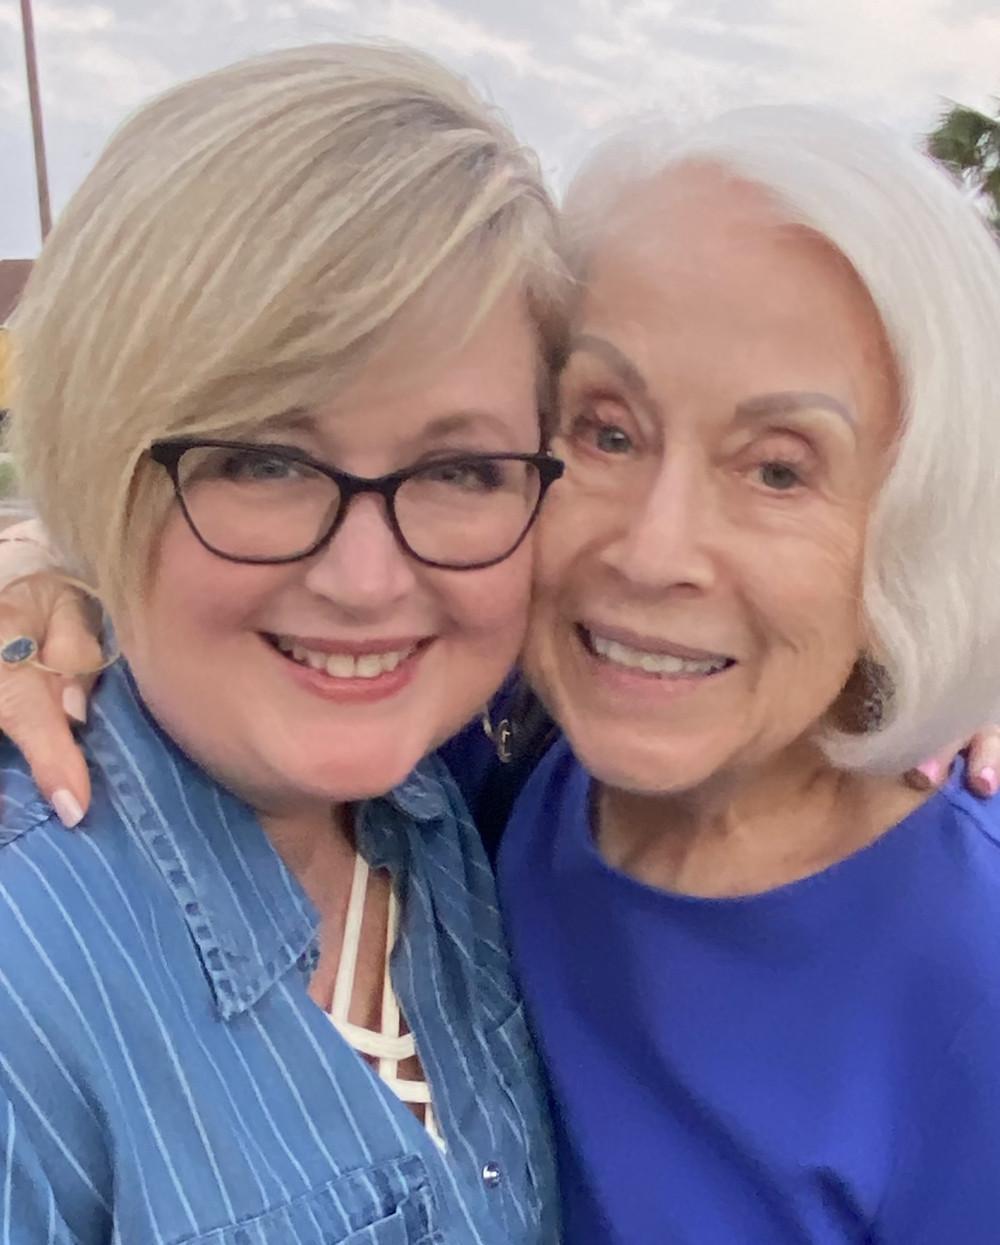 Lori Williams and her mom